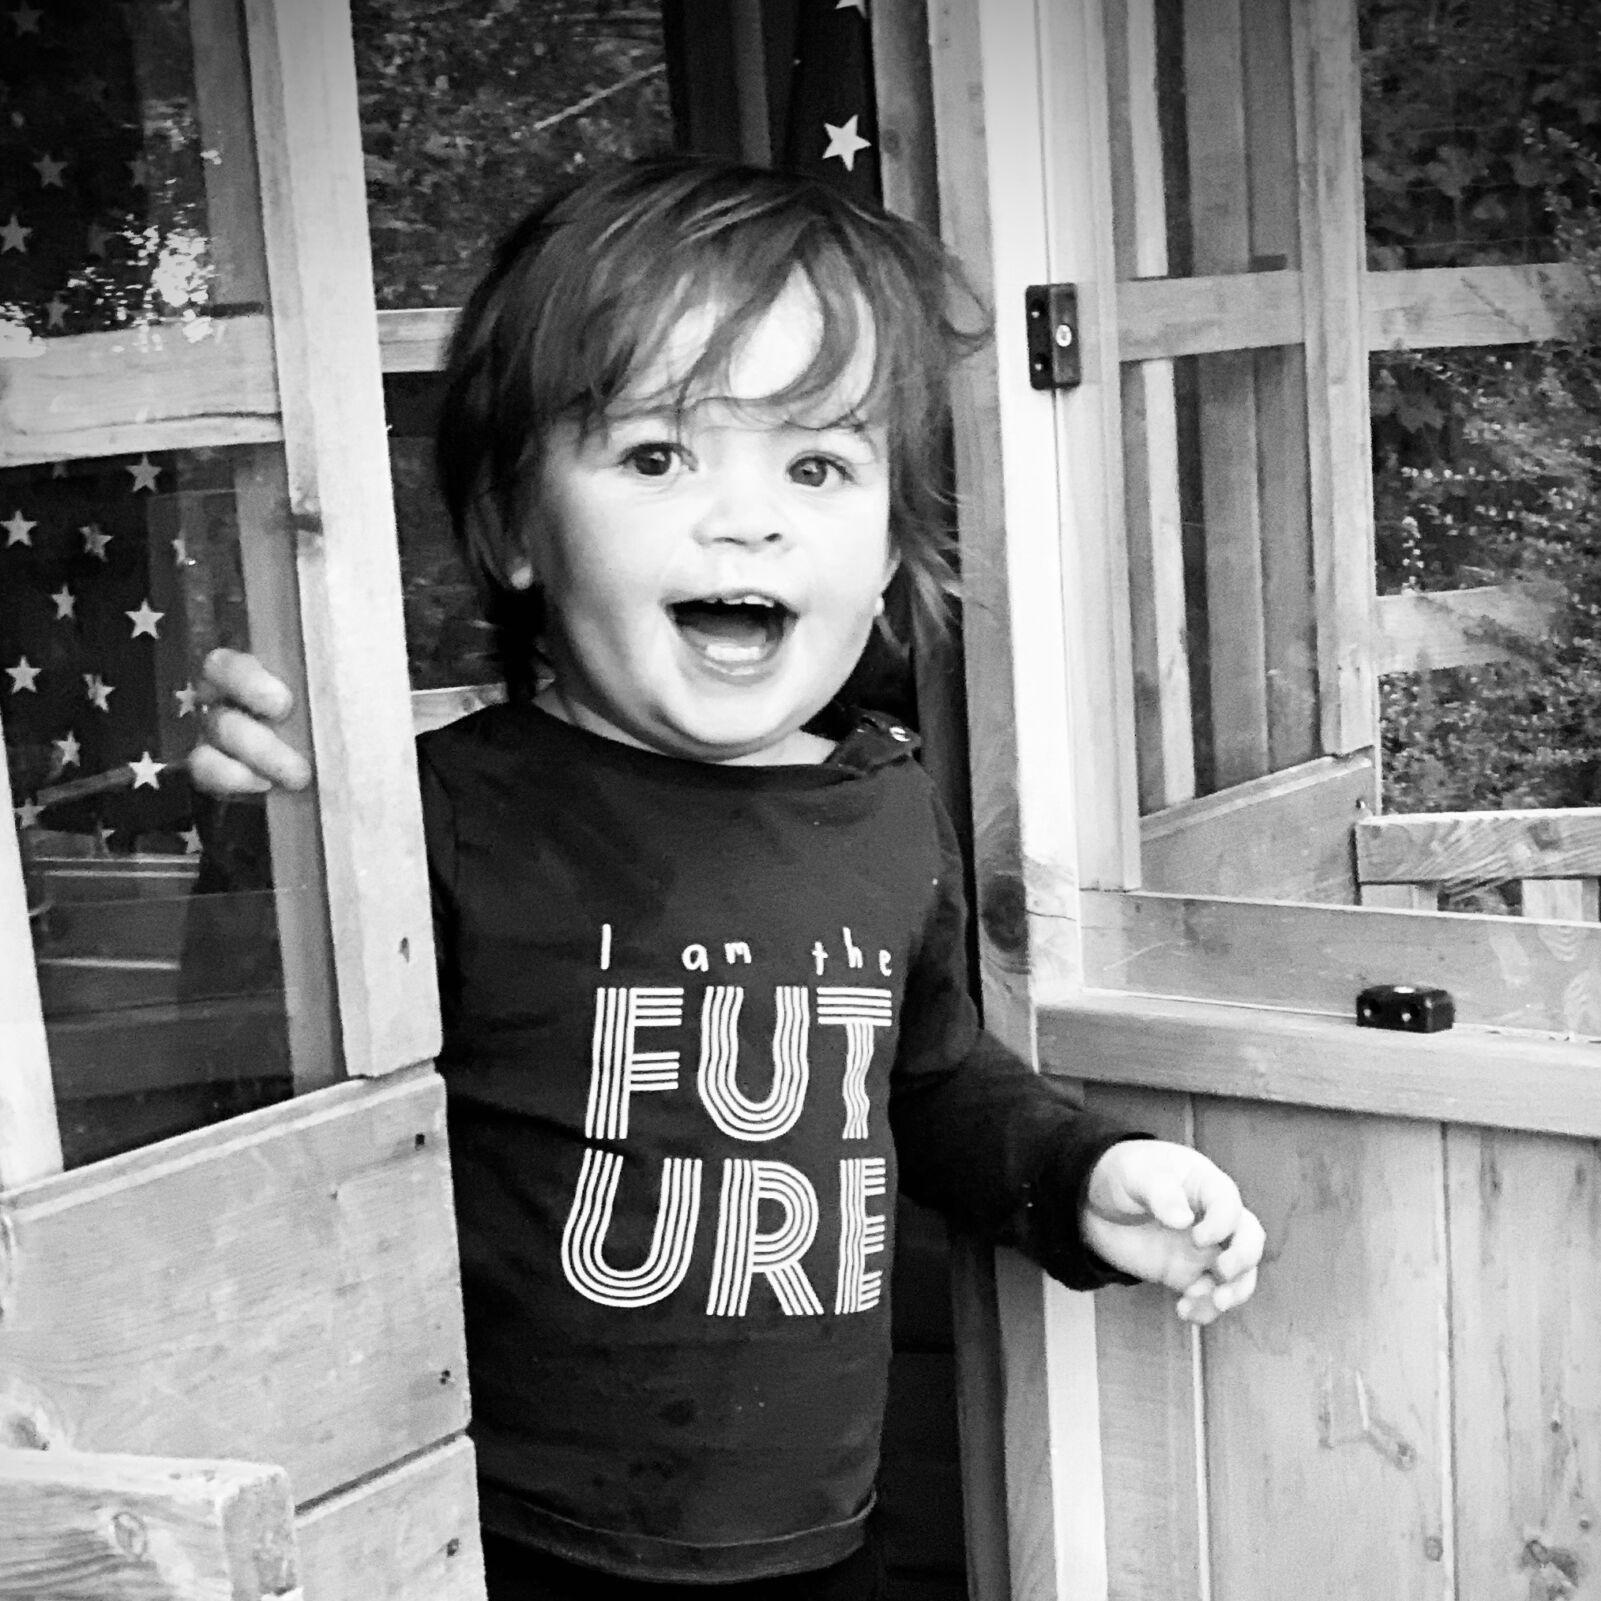 child wearing I am the future tshirt